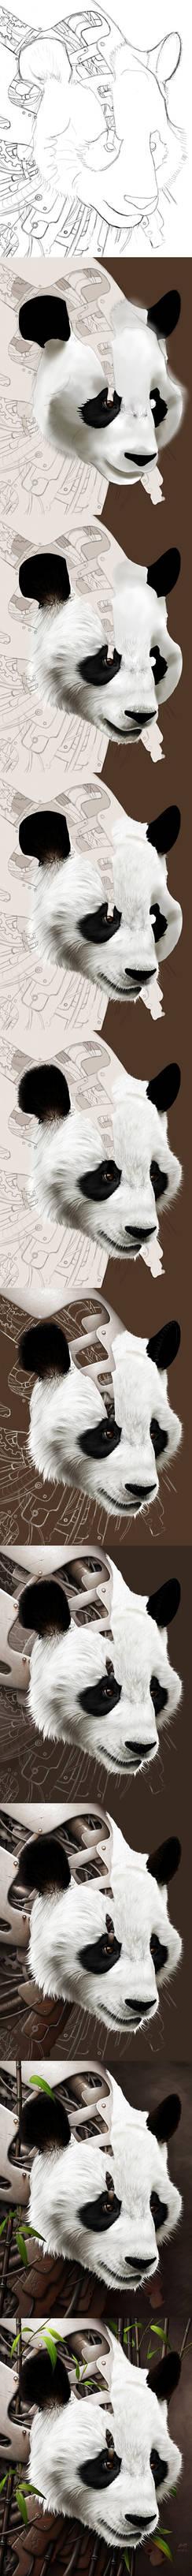 Wild 2 - The Panda - Steps